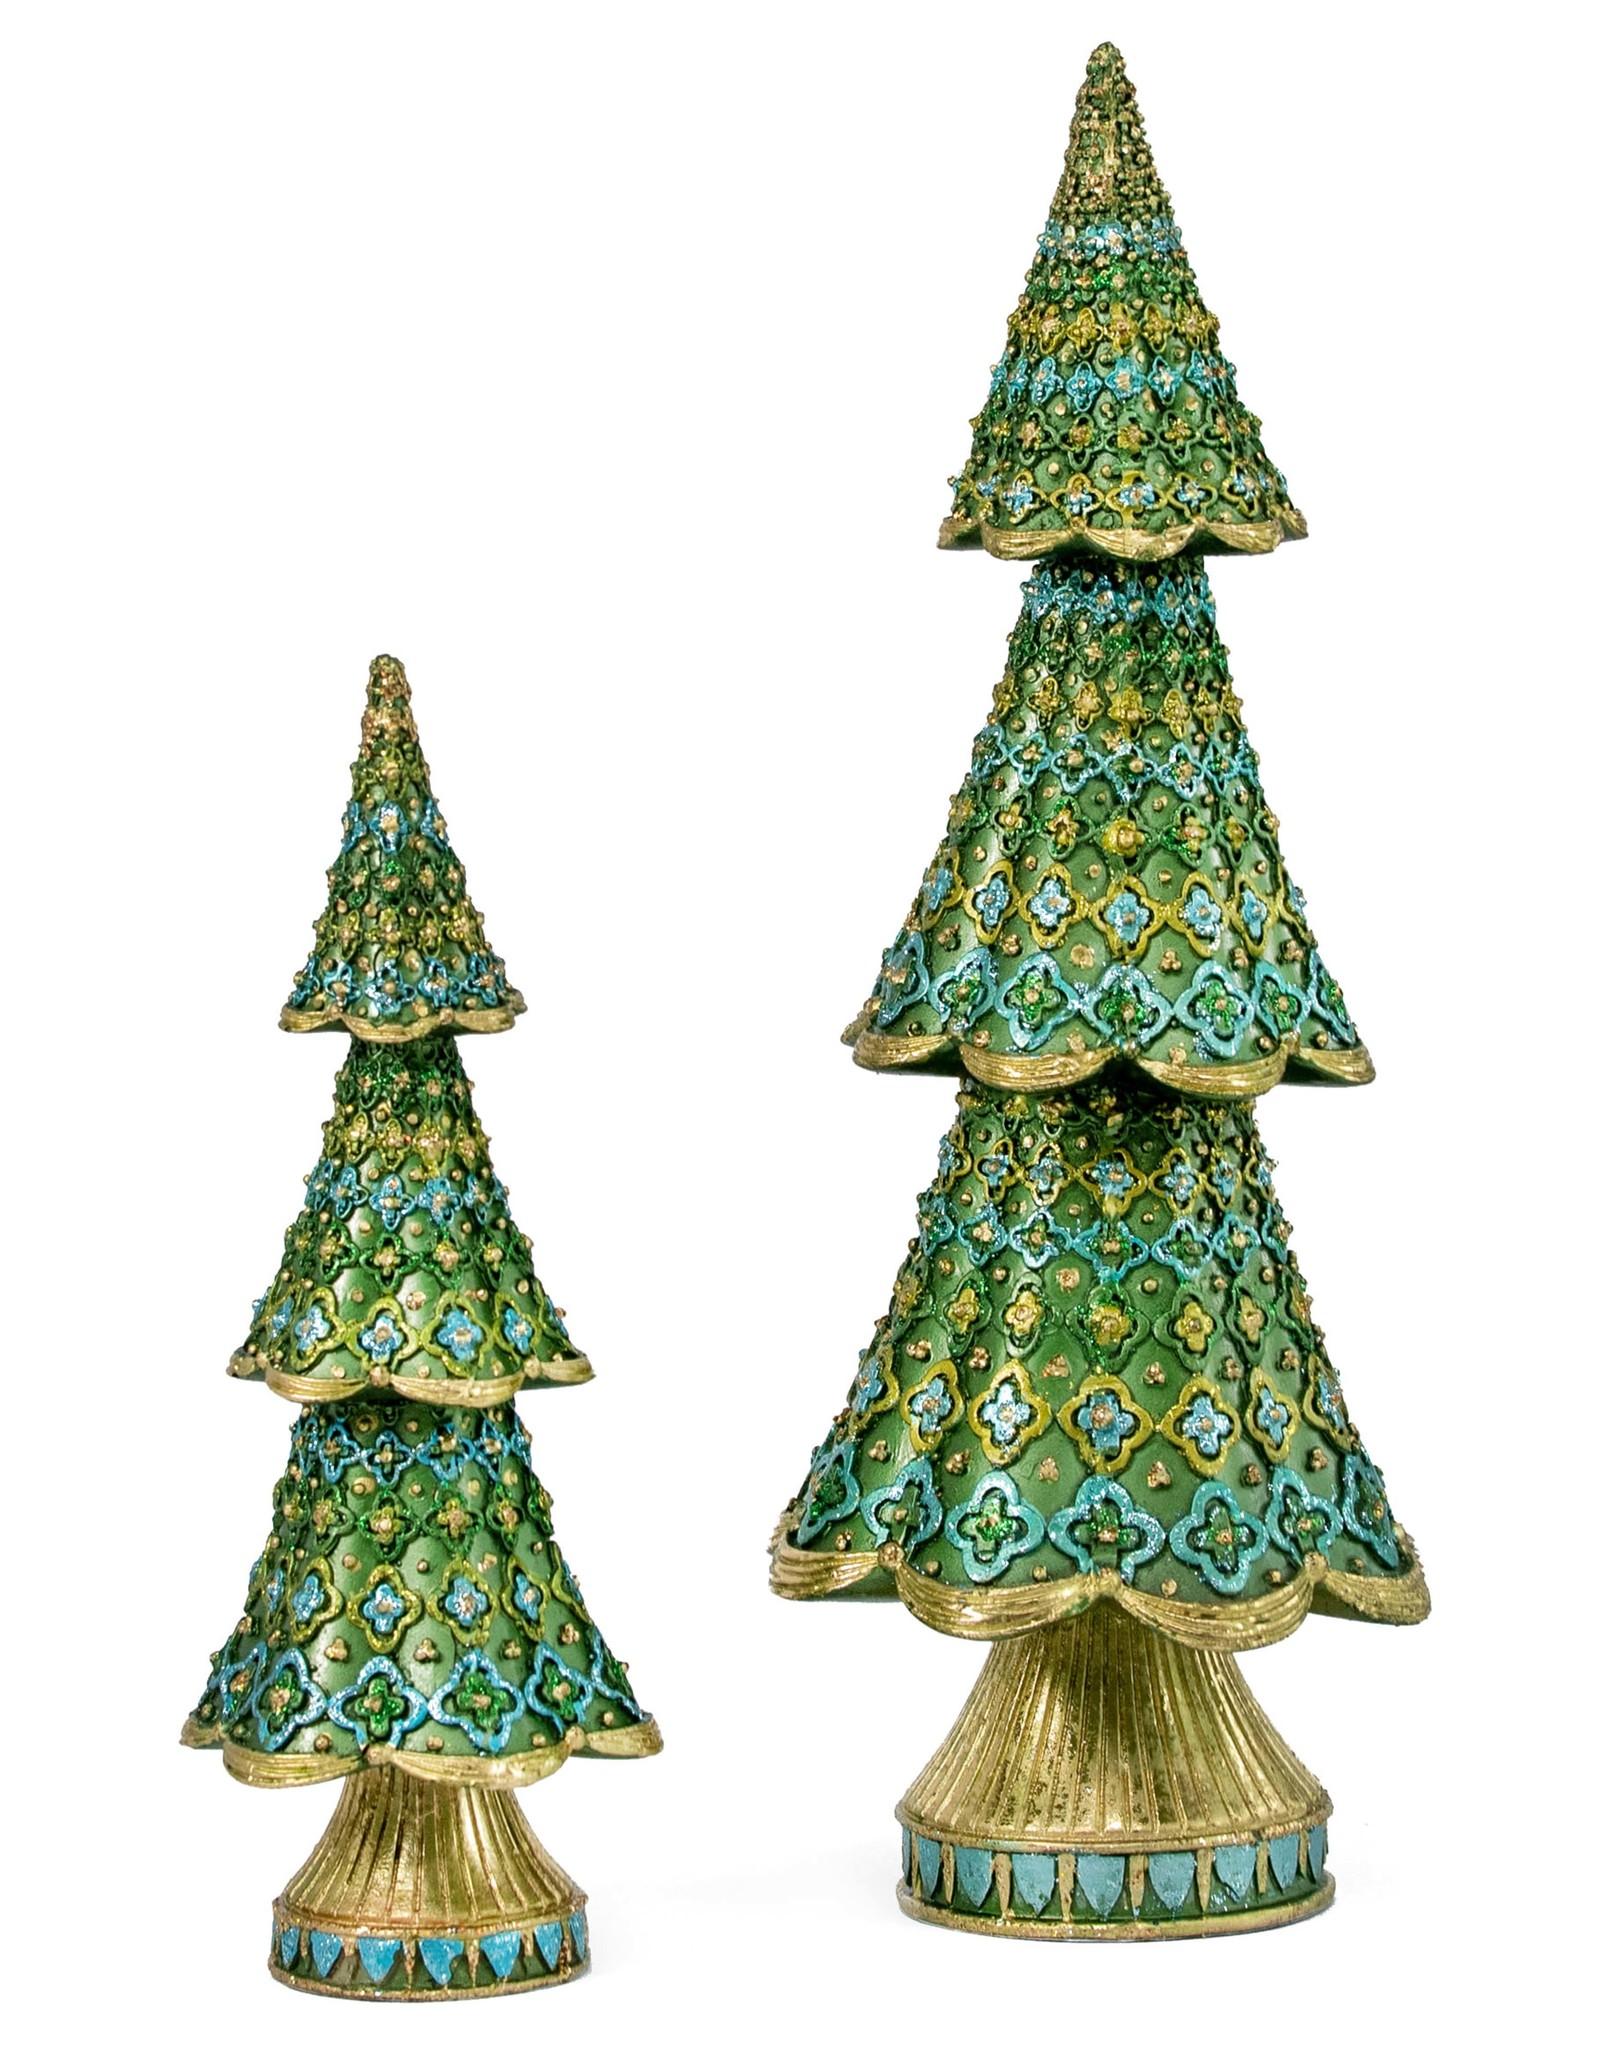 DEKORASYON SMALL SEVILLE NEO TREE